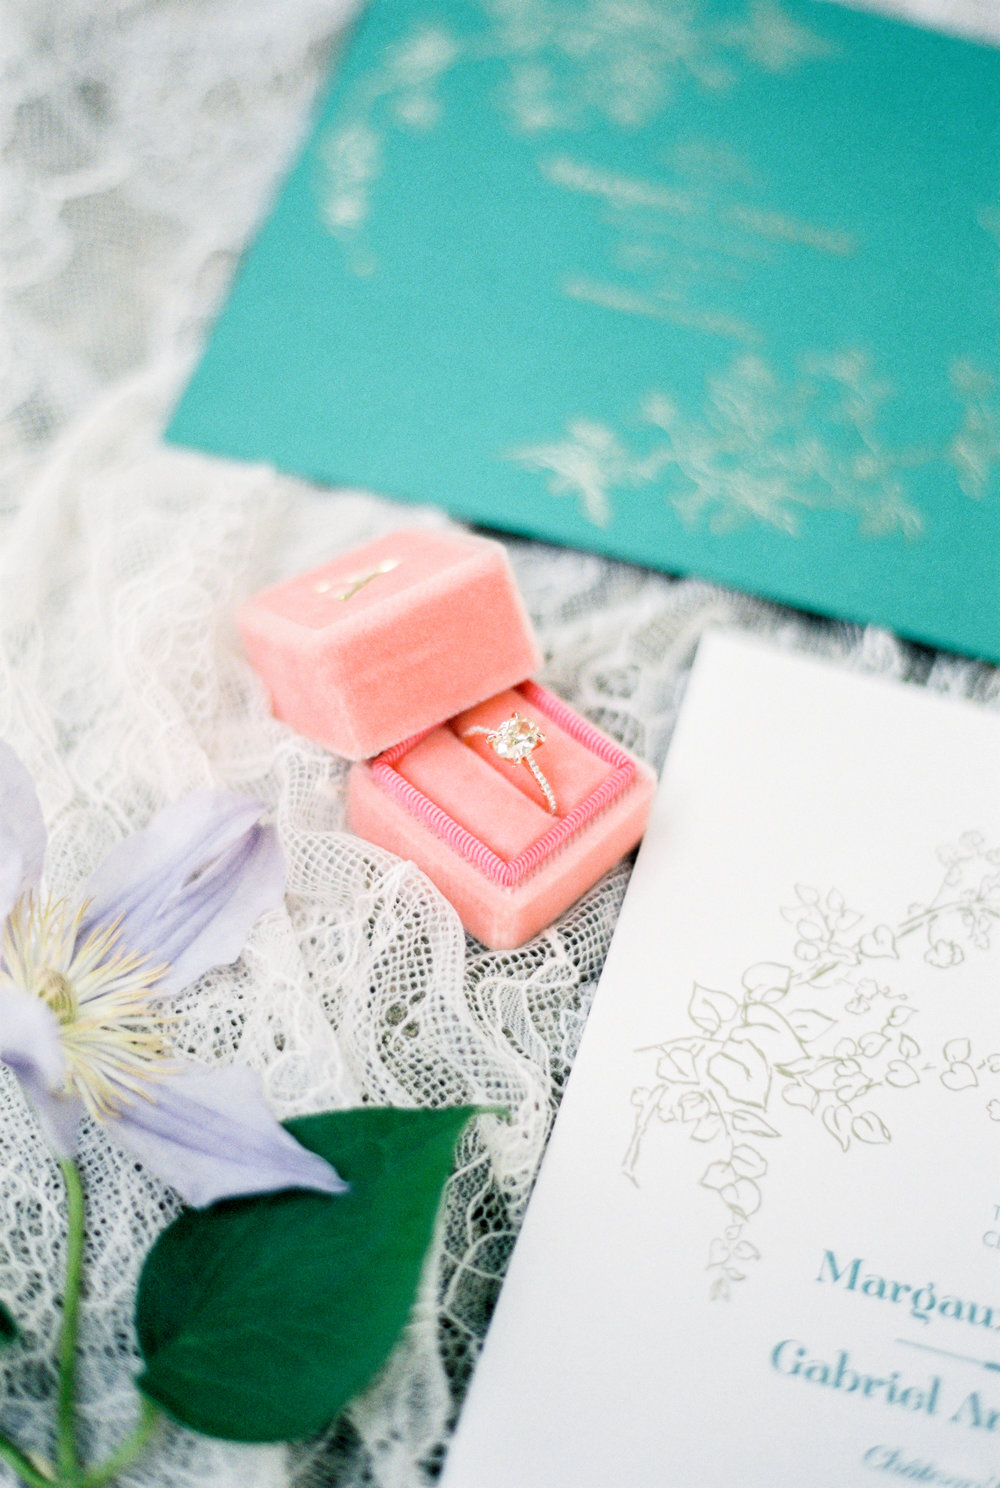 Susie Saltzman Rose Gold Ring - Jacqueline Anne Photography - Nova Scotia Wedding Photographer